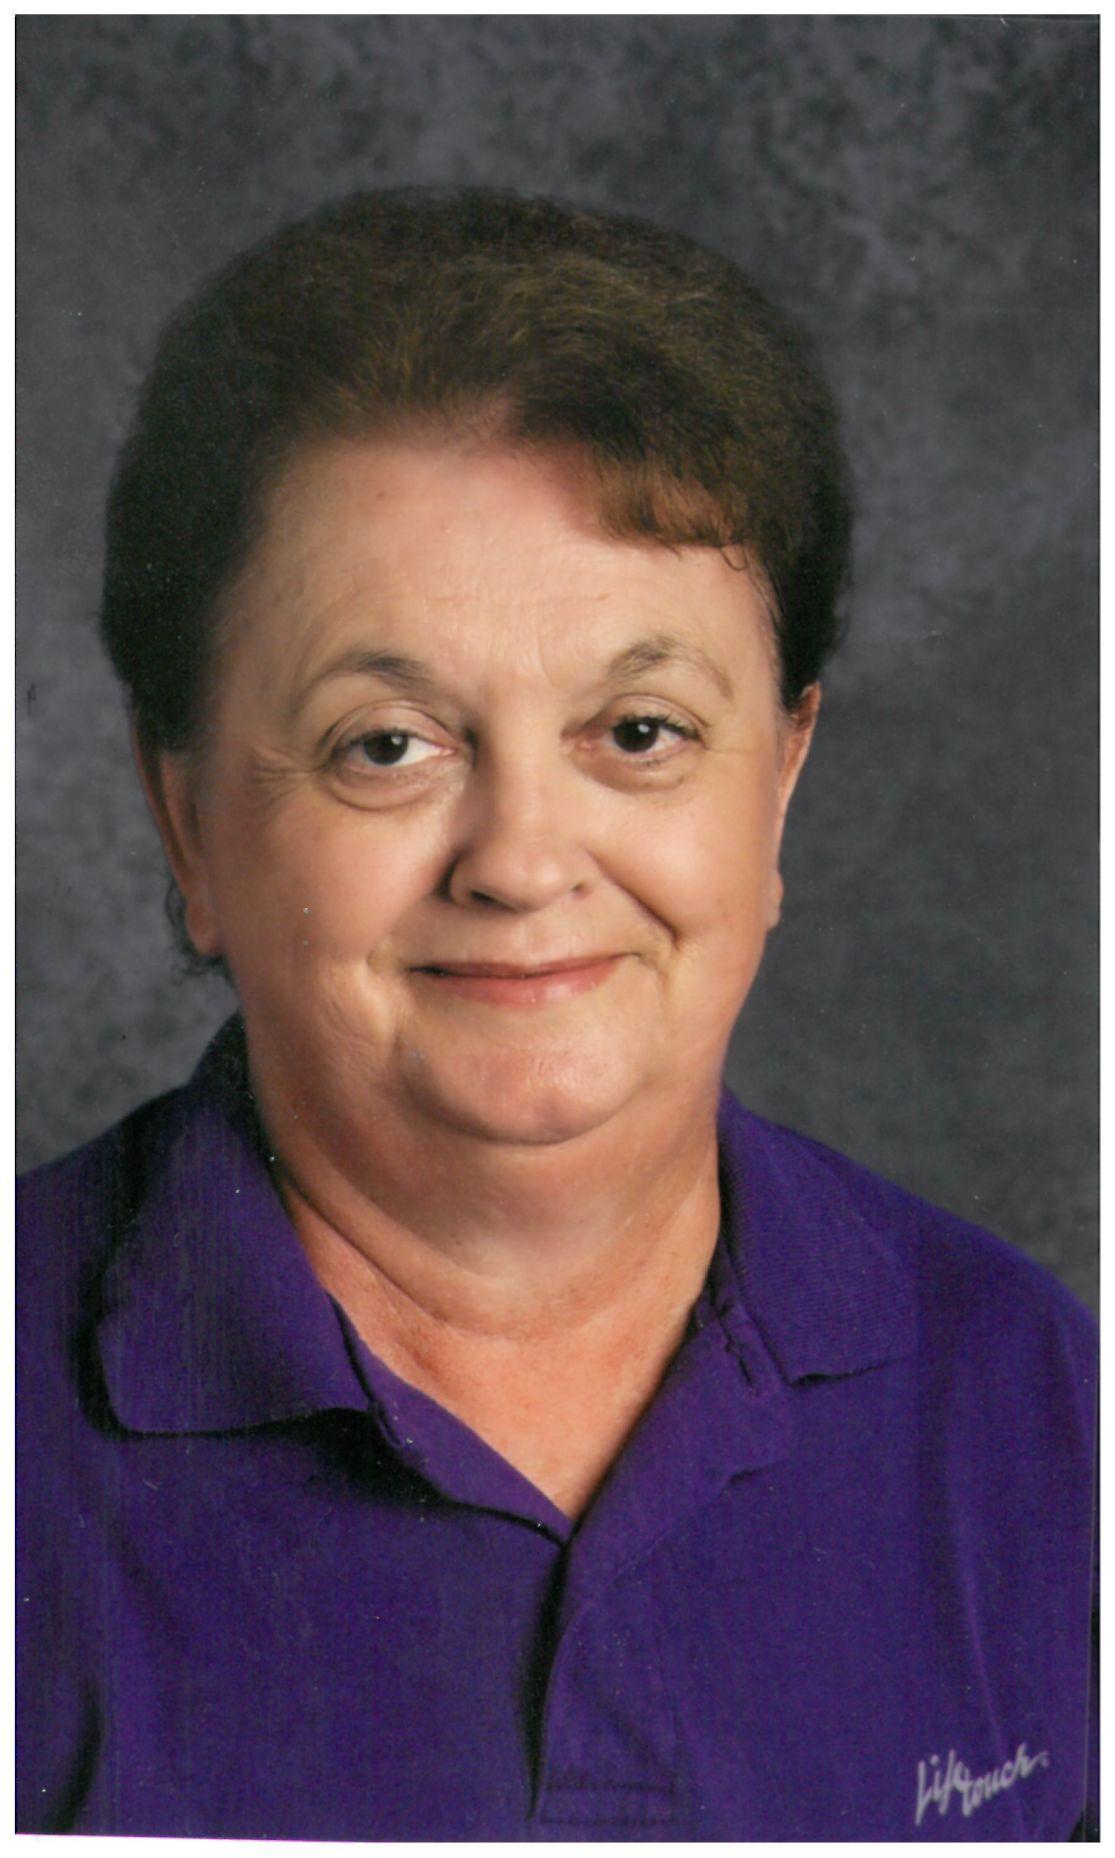 Marilyn Edsill